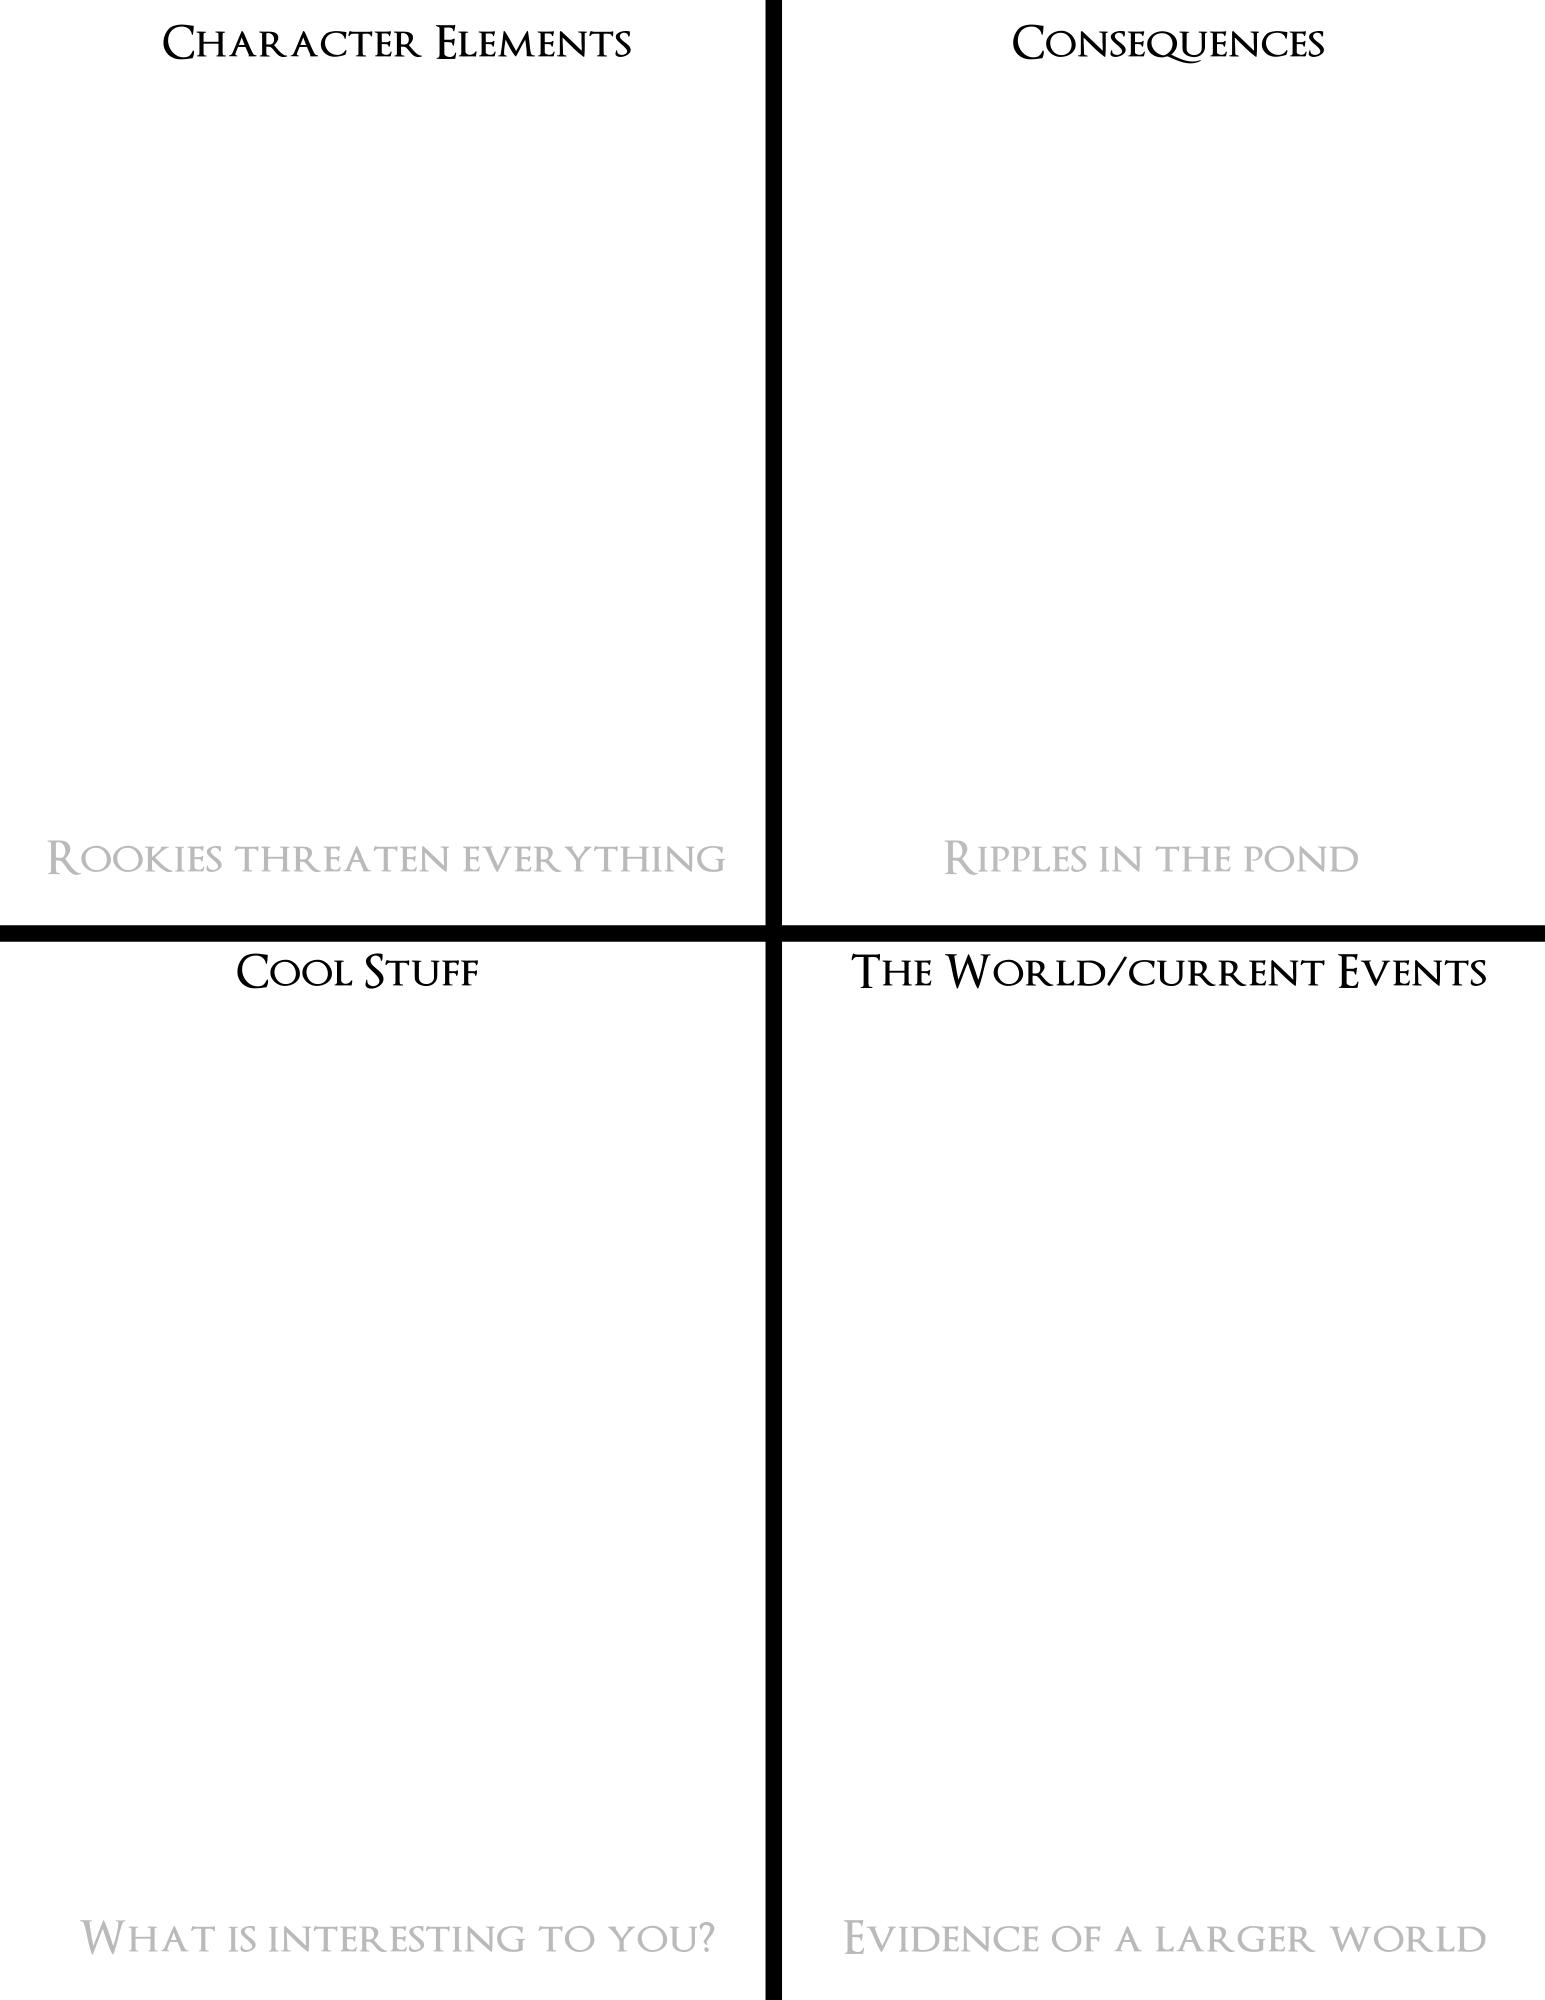 Improvisional Worksheet